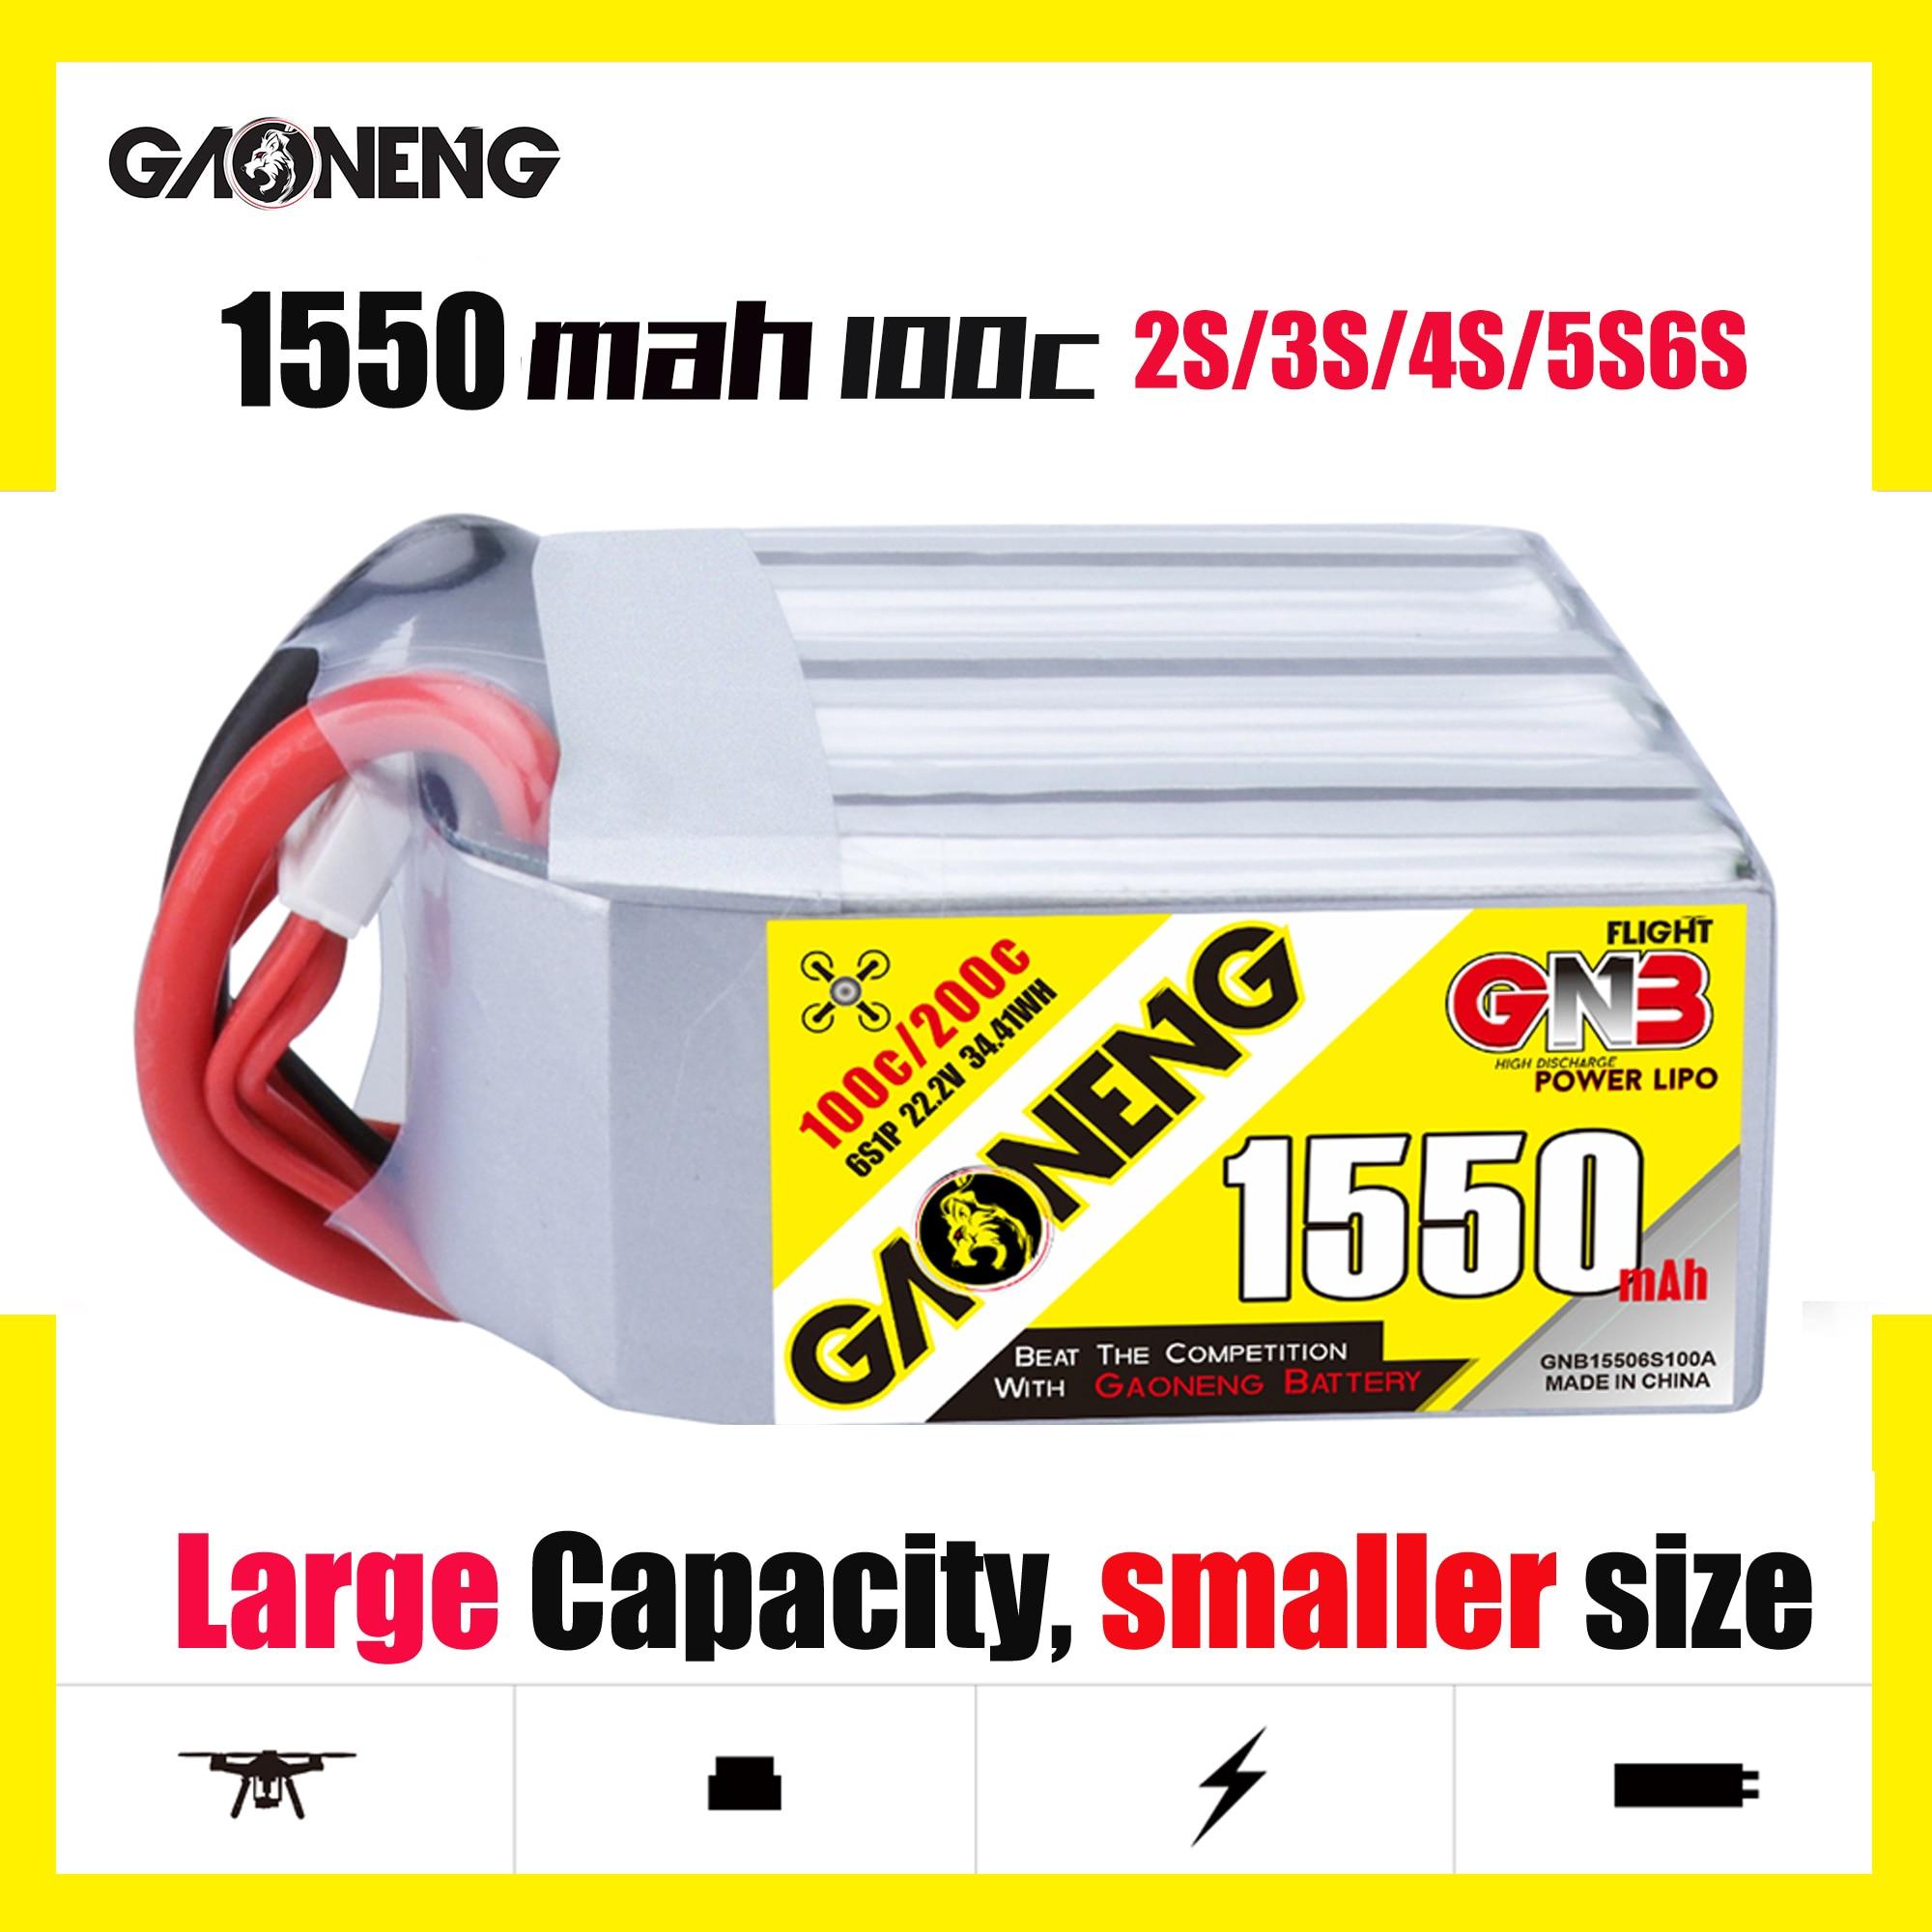 Gaoneng GNB 1550mAh 100C 2P 2S 3S 4S 5S 6S 4-axis FPV Battery 7.4V-22.2V High Power Batteries Smaller Large Capacity